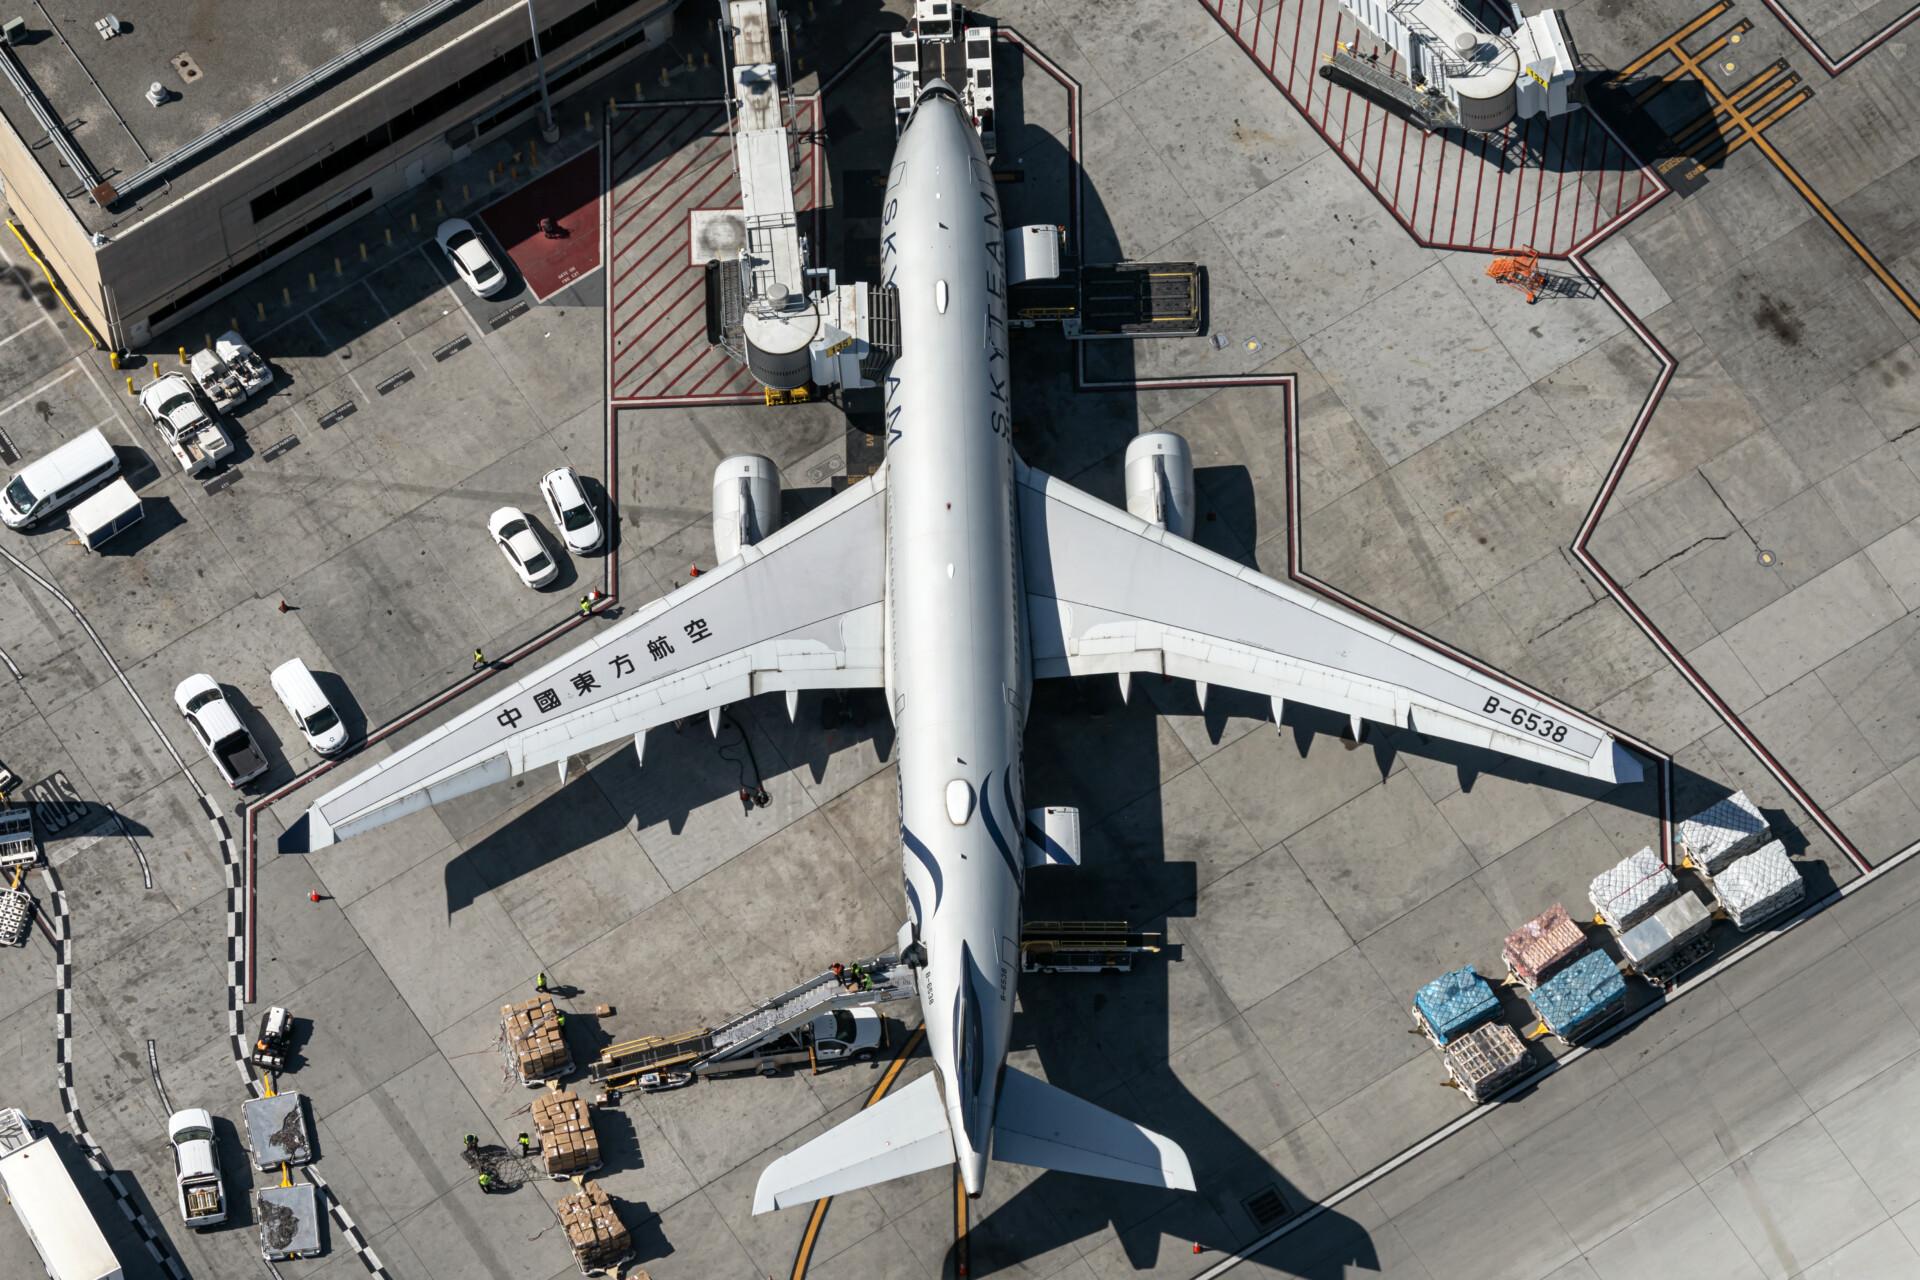 Beijing Daxing, Chinese Aviation, 20 million passengers